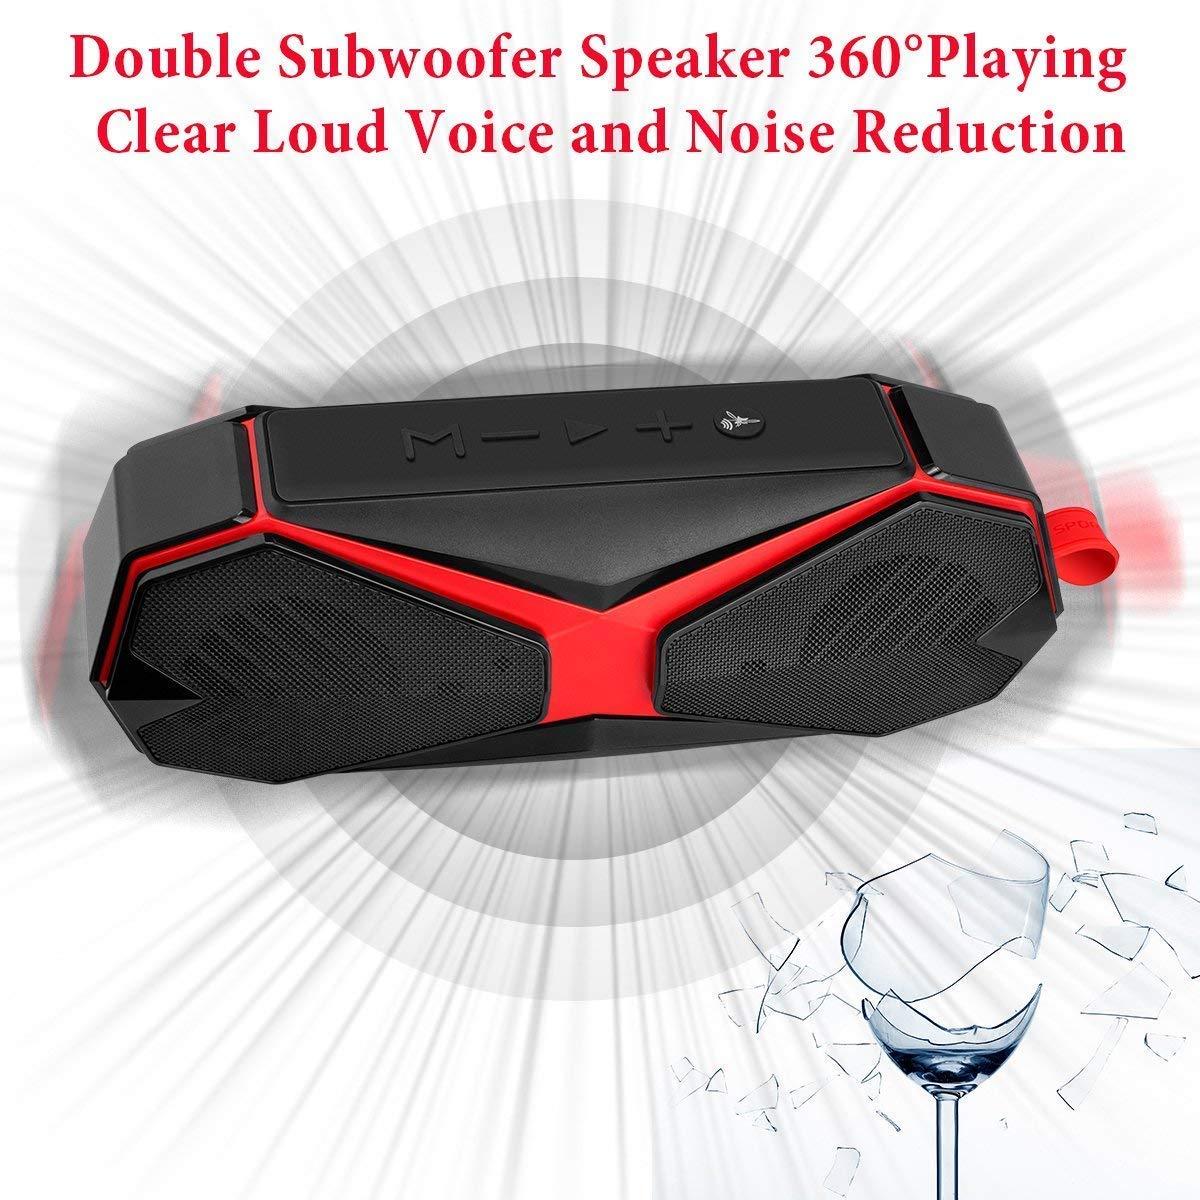 iTecFree Bluetooth Speaker IPX7 Waterproof Shower Speaker, Wireless Speaker Hands Free Call Function Stereo Loudspeaker for iPhone Android Samsung iPad Tablet Outdoor Bath Beach